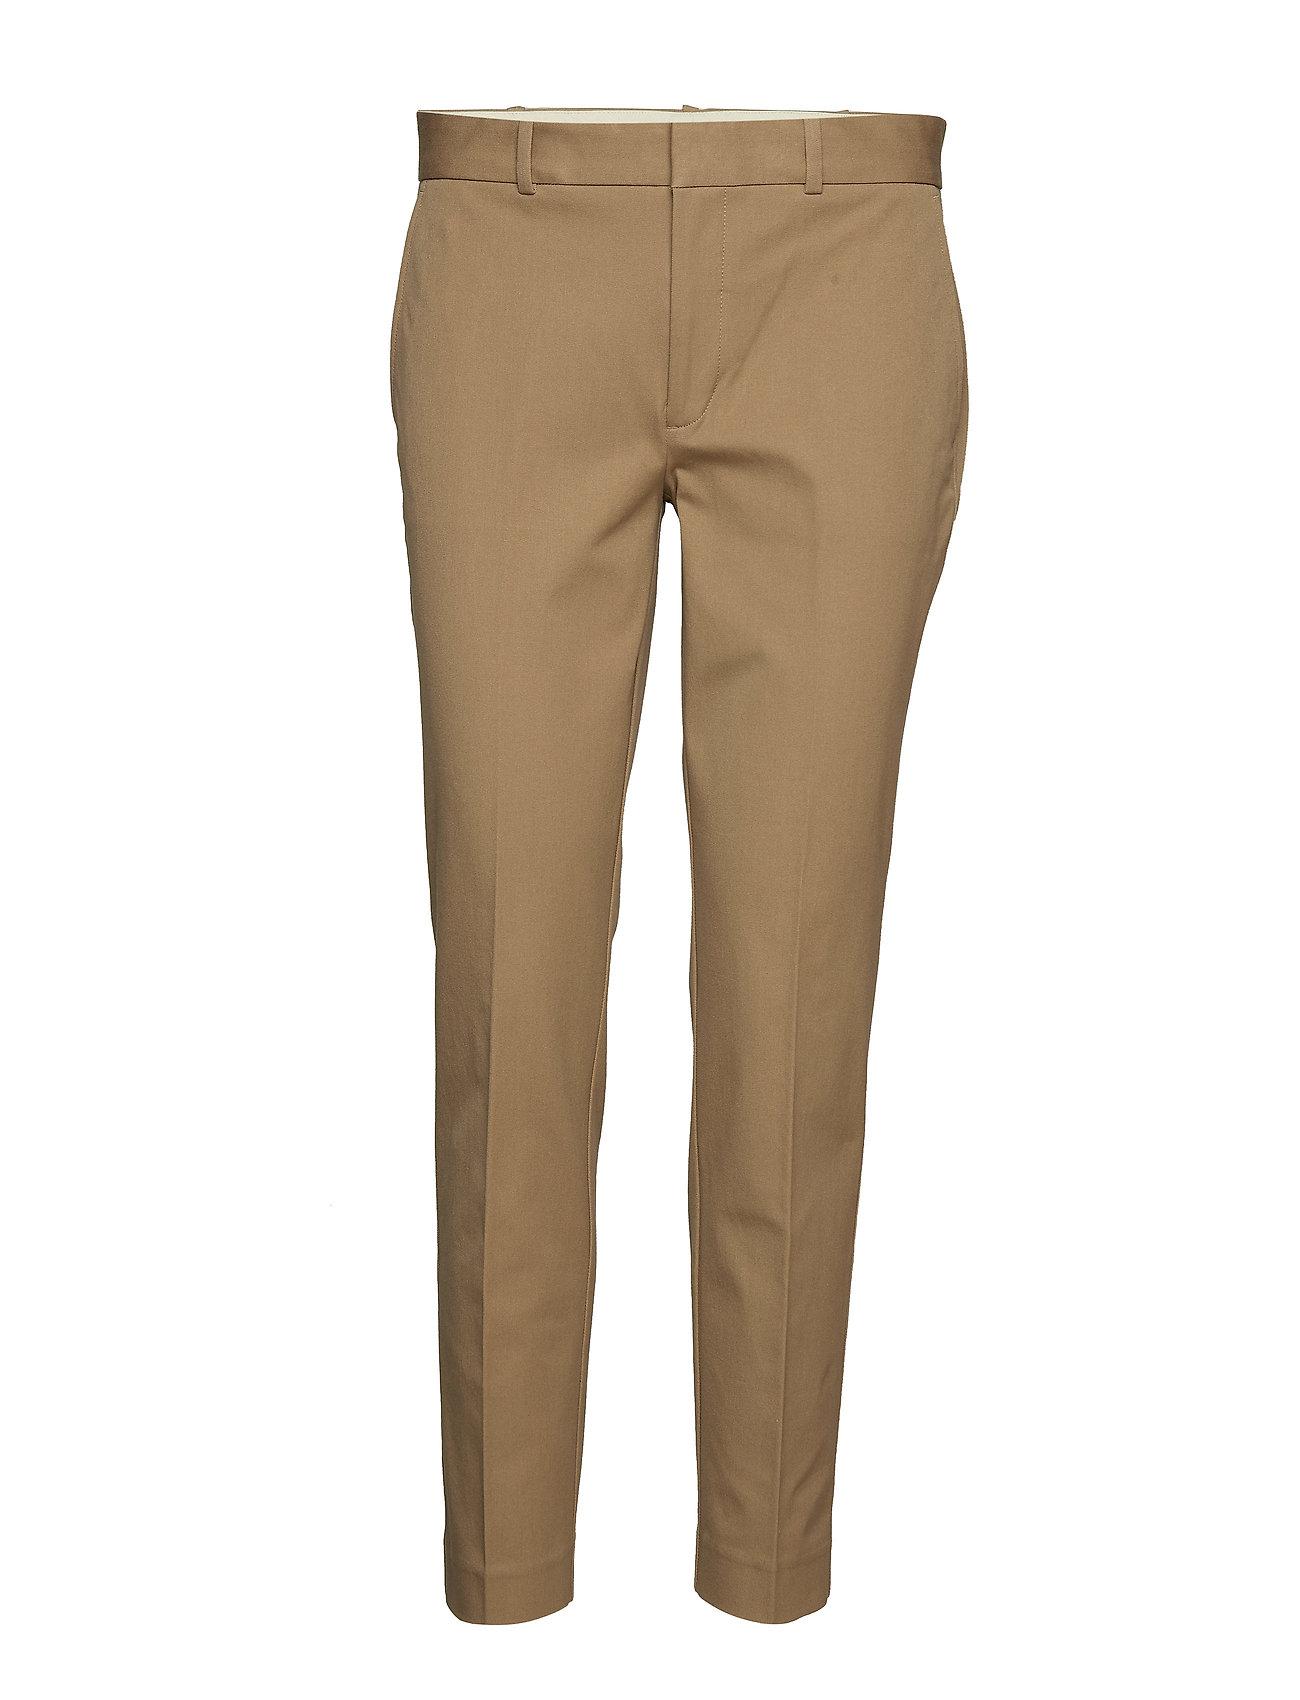 Polo Ralph Lauren Bi-Stretch Twill Pant - LUXURY TAN